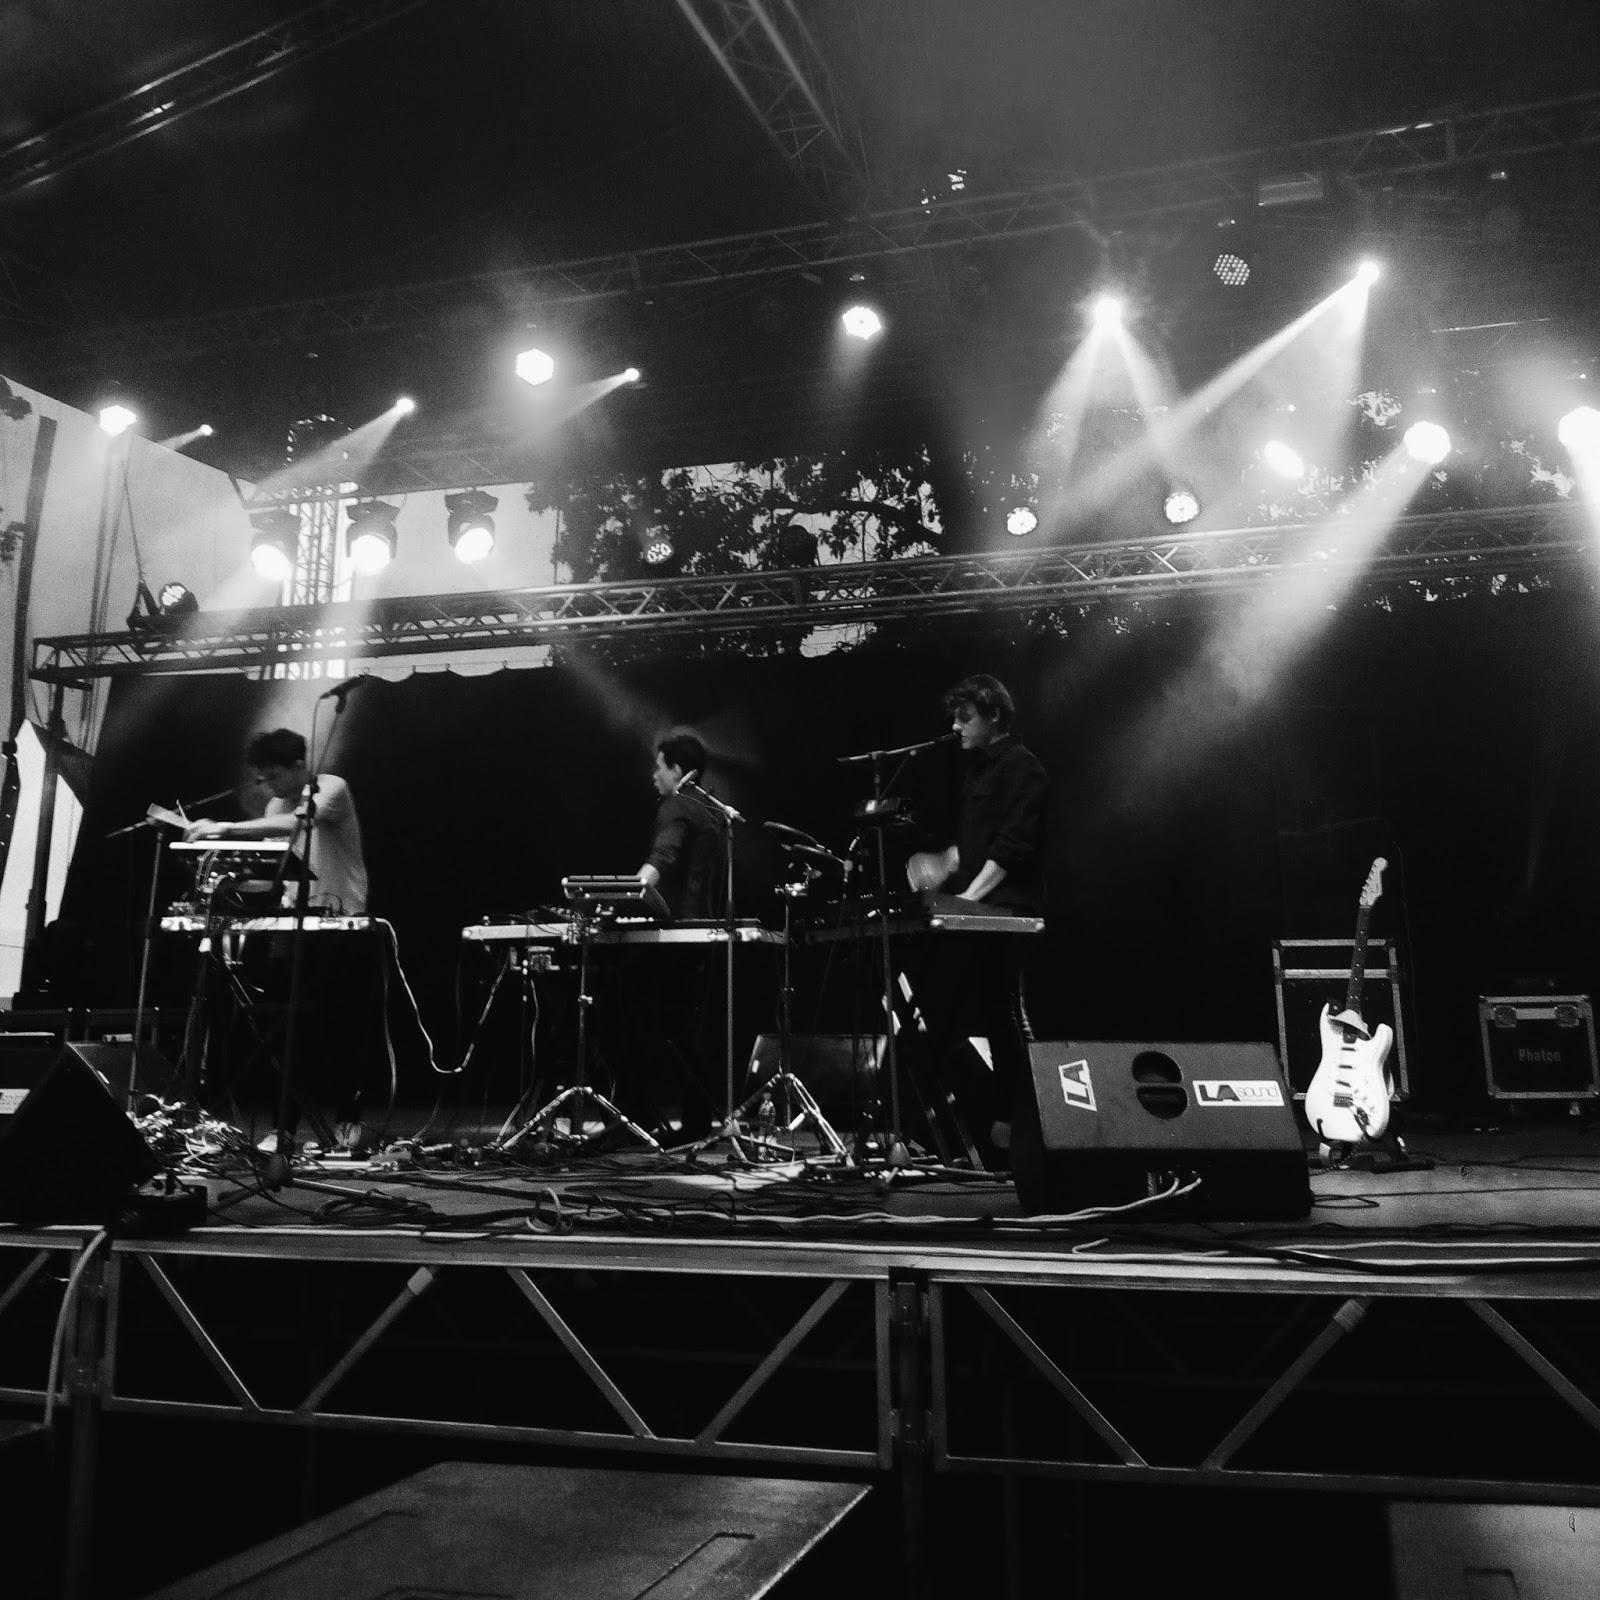 koncert polské kapely KAMP! na indie festivalu Fingers Up v Mohelnici